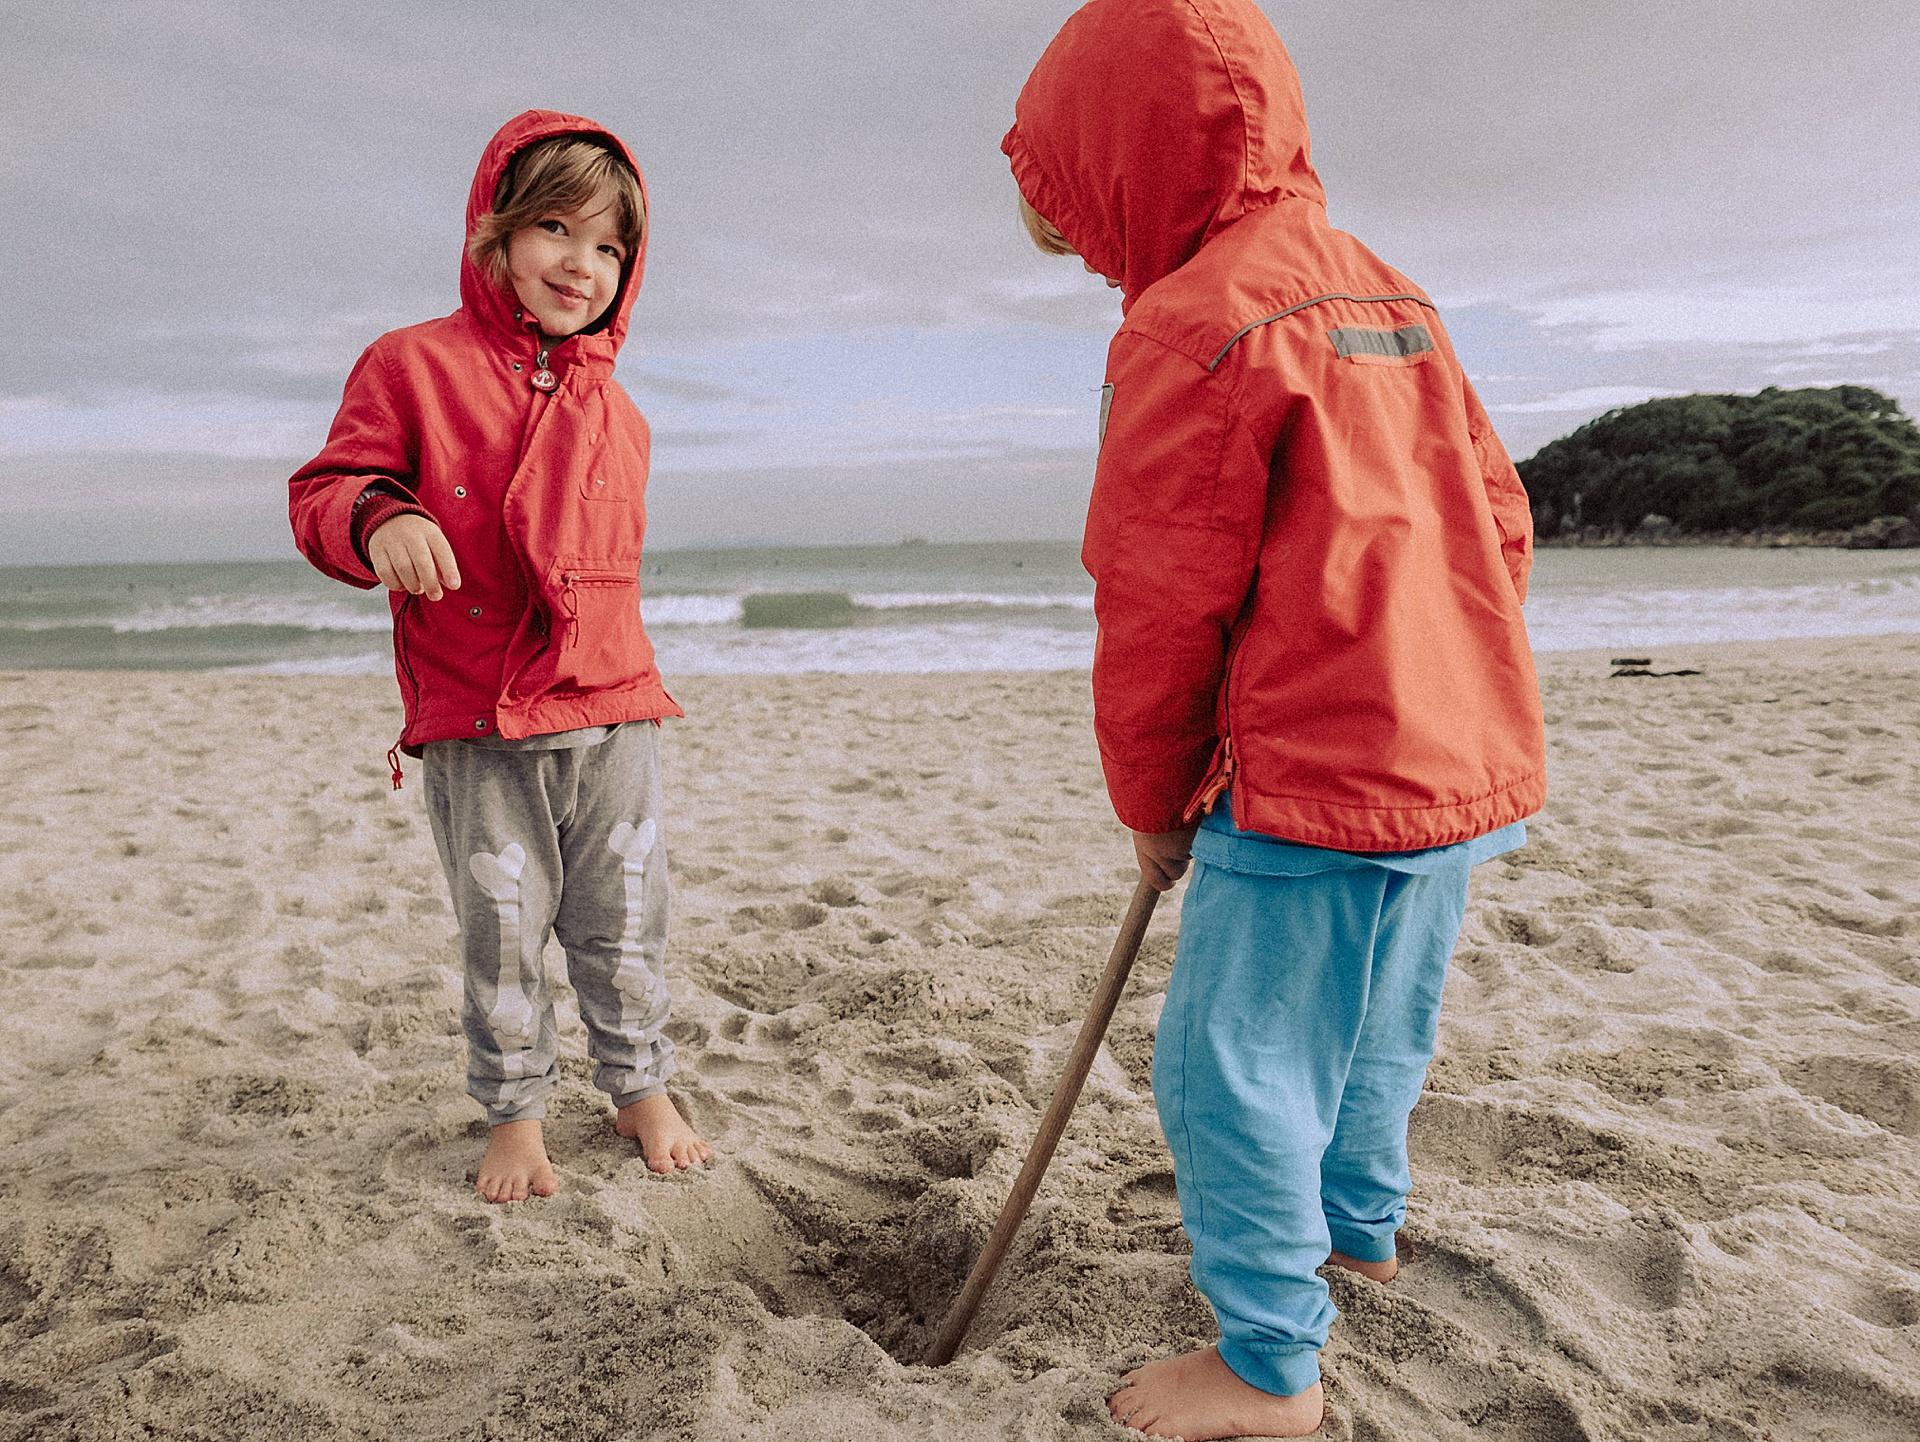 family-roadtrip-neuseeland-travelnewzealand-danielzube_0637.jpg